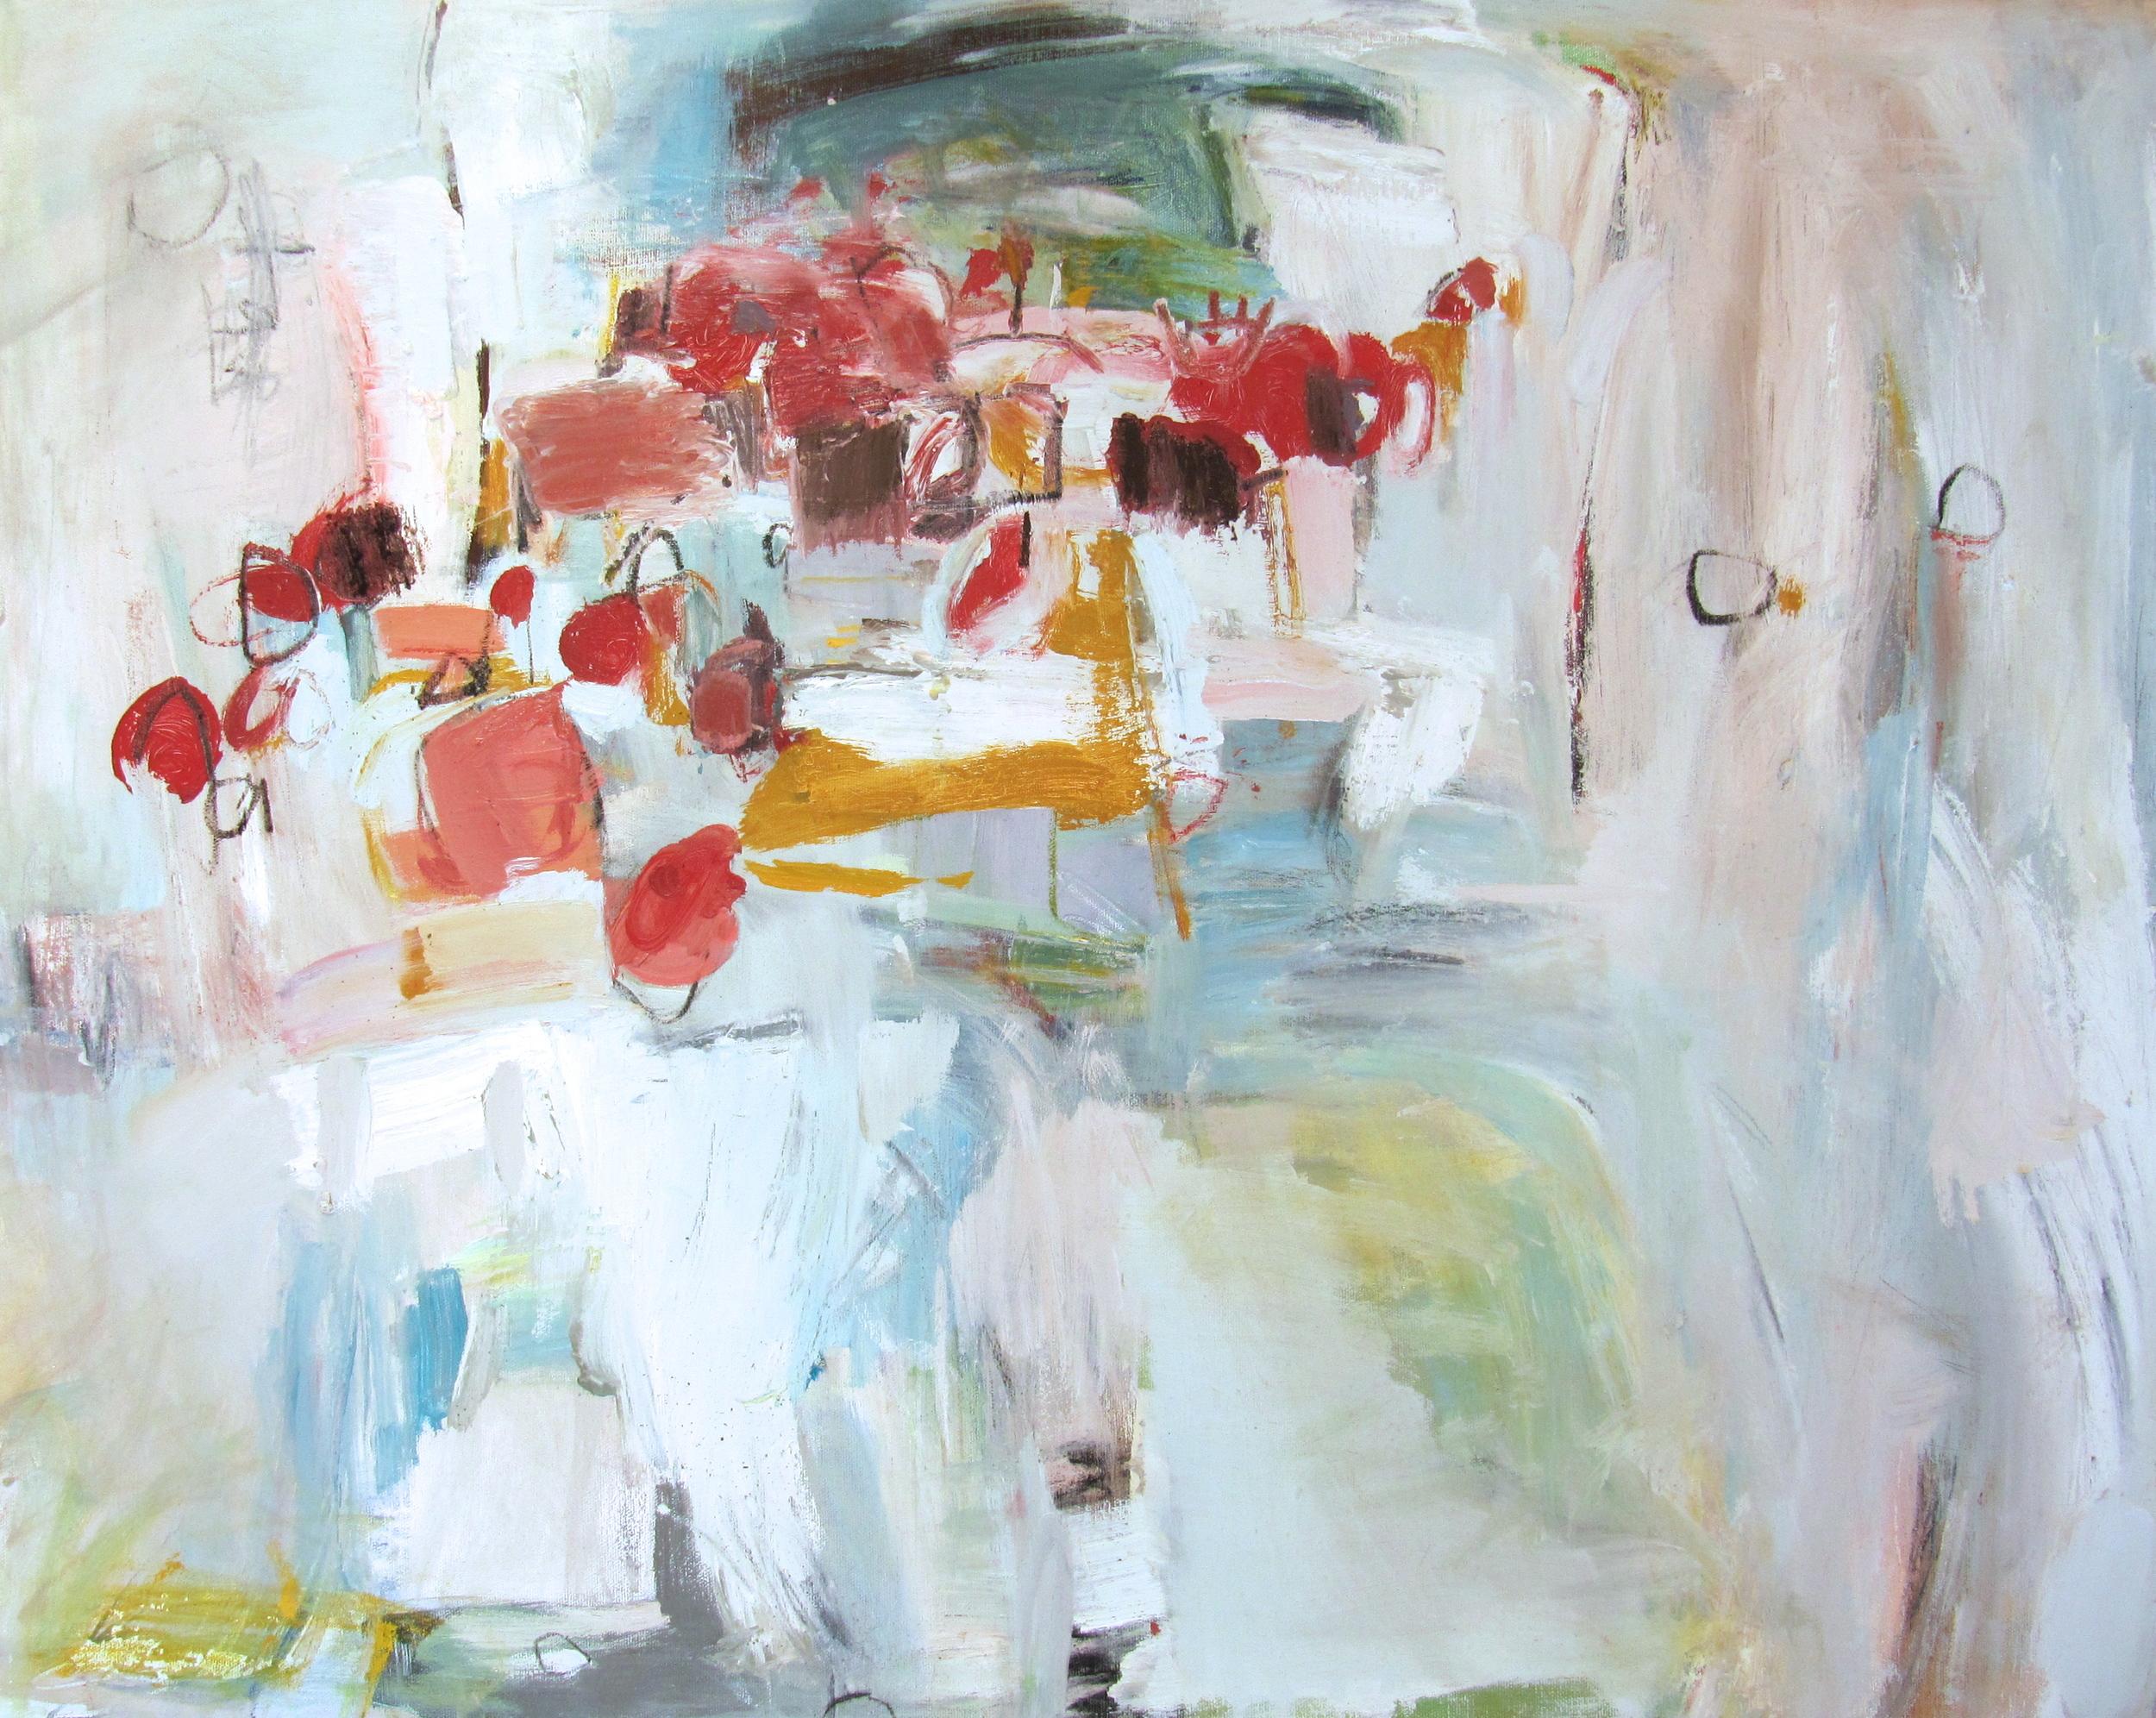 Osmose, 2013 / Oil on canvas, 24 x 30